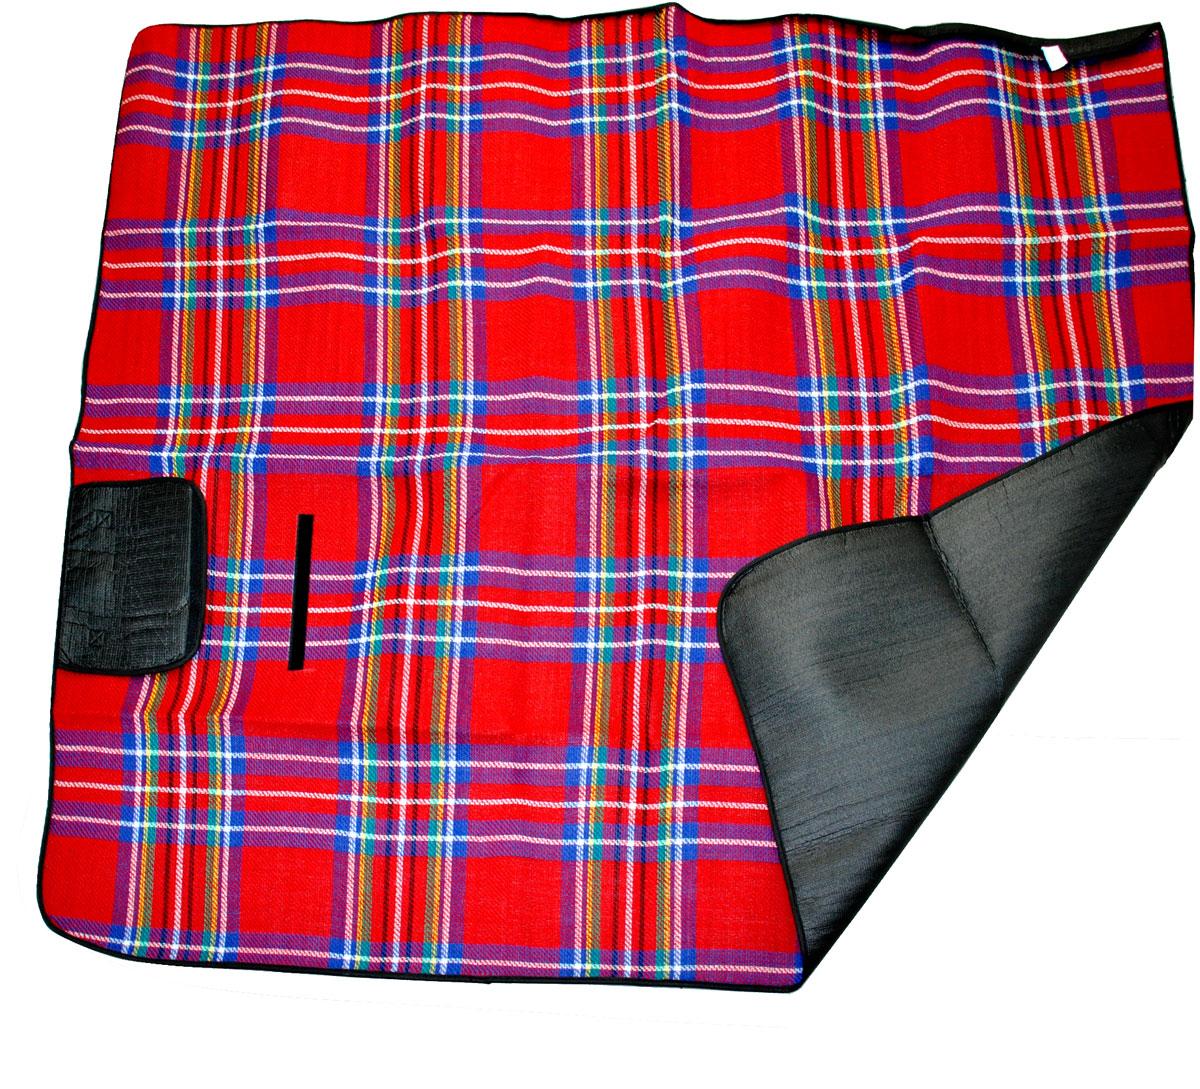 Picnic Blanket: Extra Large Waterproof Picnic Blanket Mat Rug Bag Pet Car